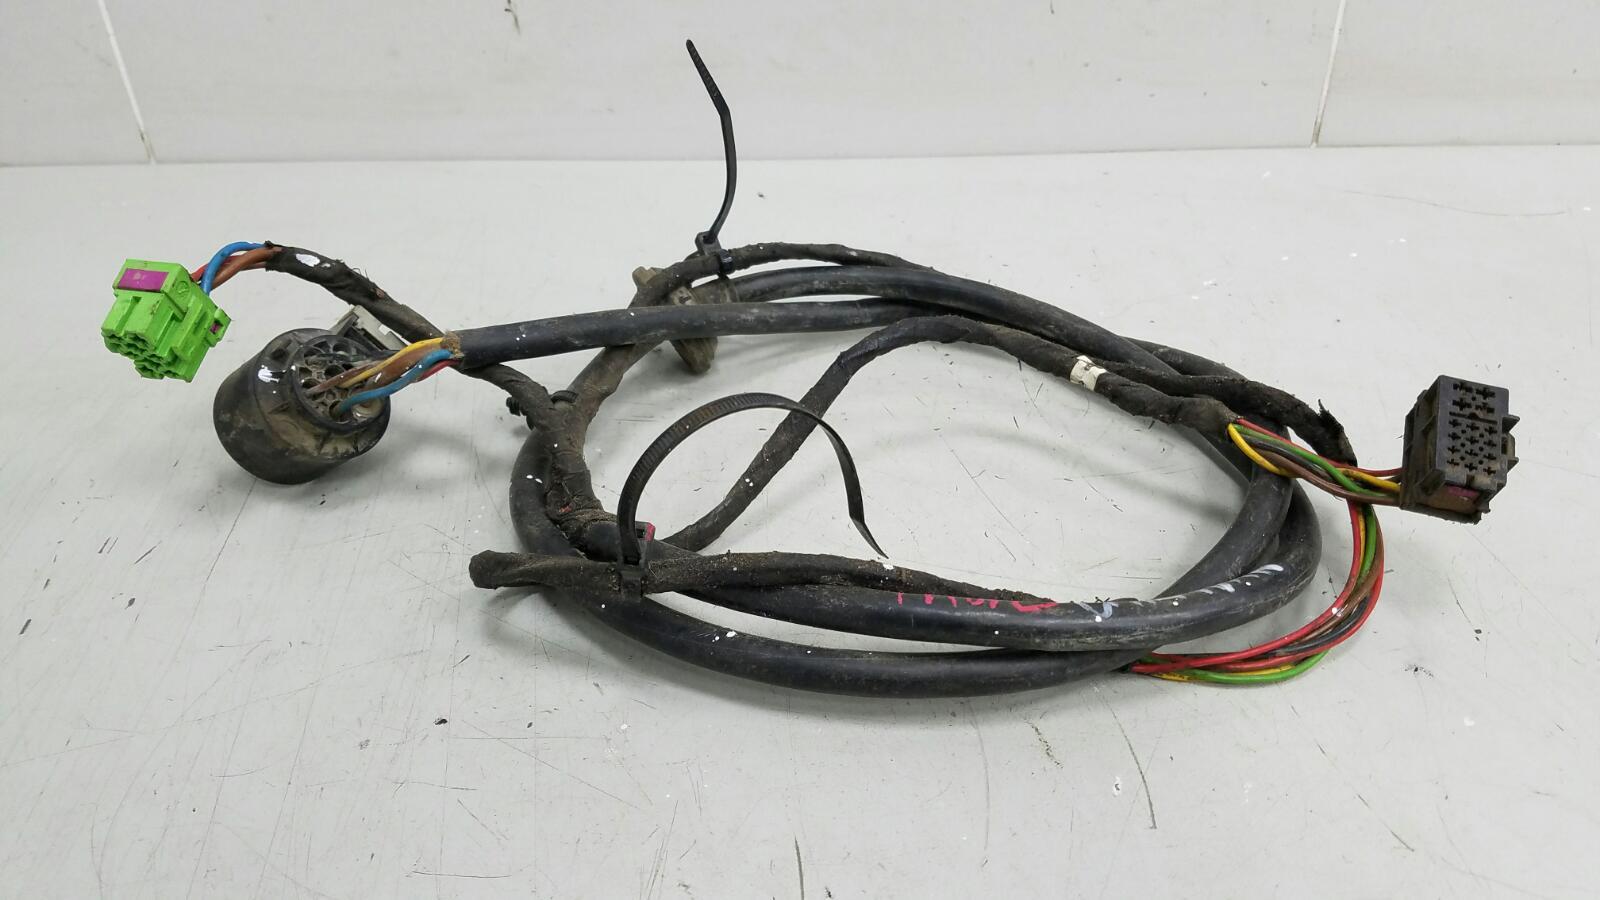 Проводка шлейф коса двери Porshe Cayenne 955 BMV M02.2Y 3.2Л 2005